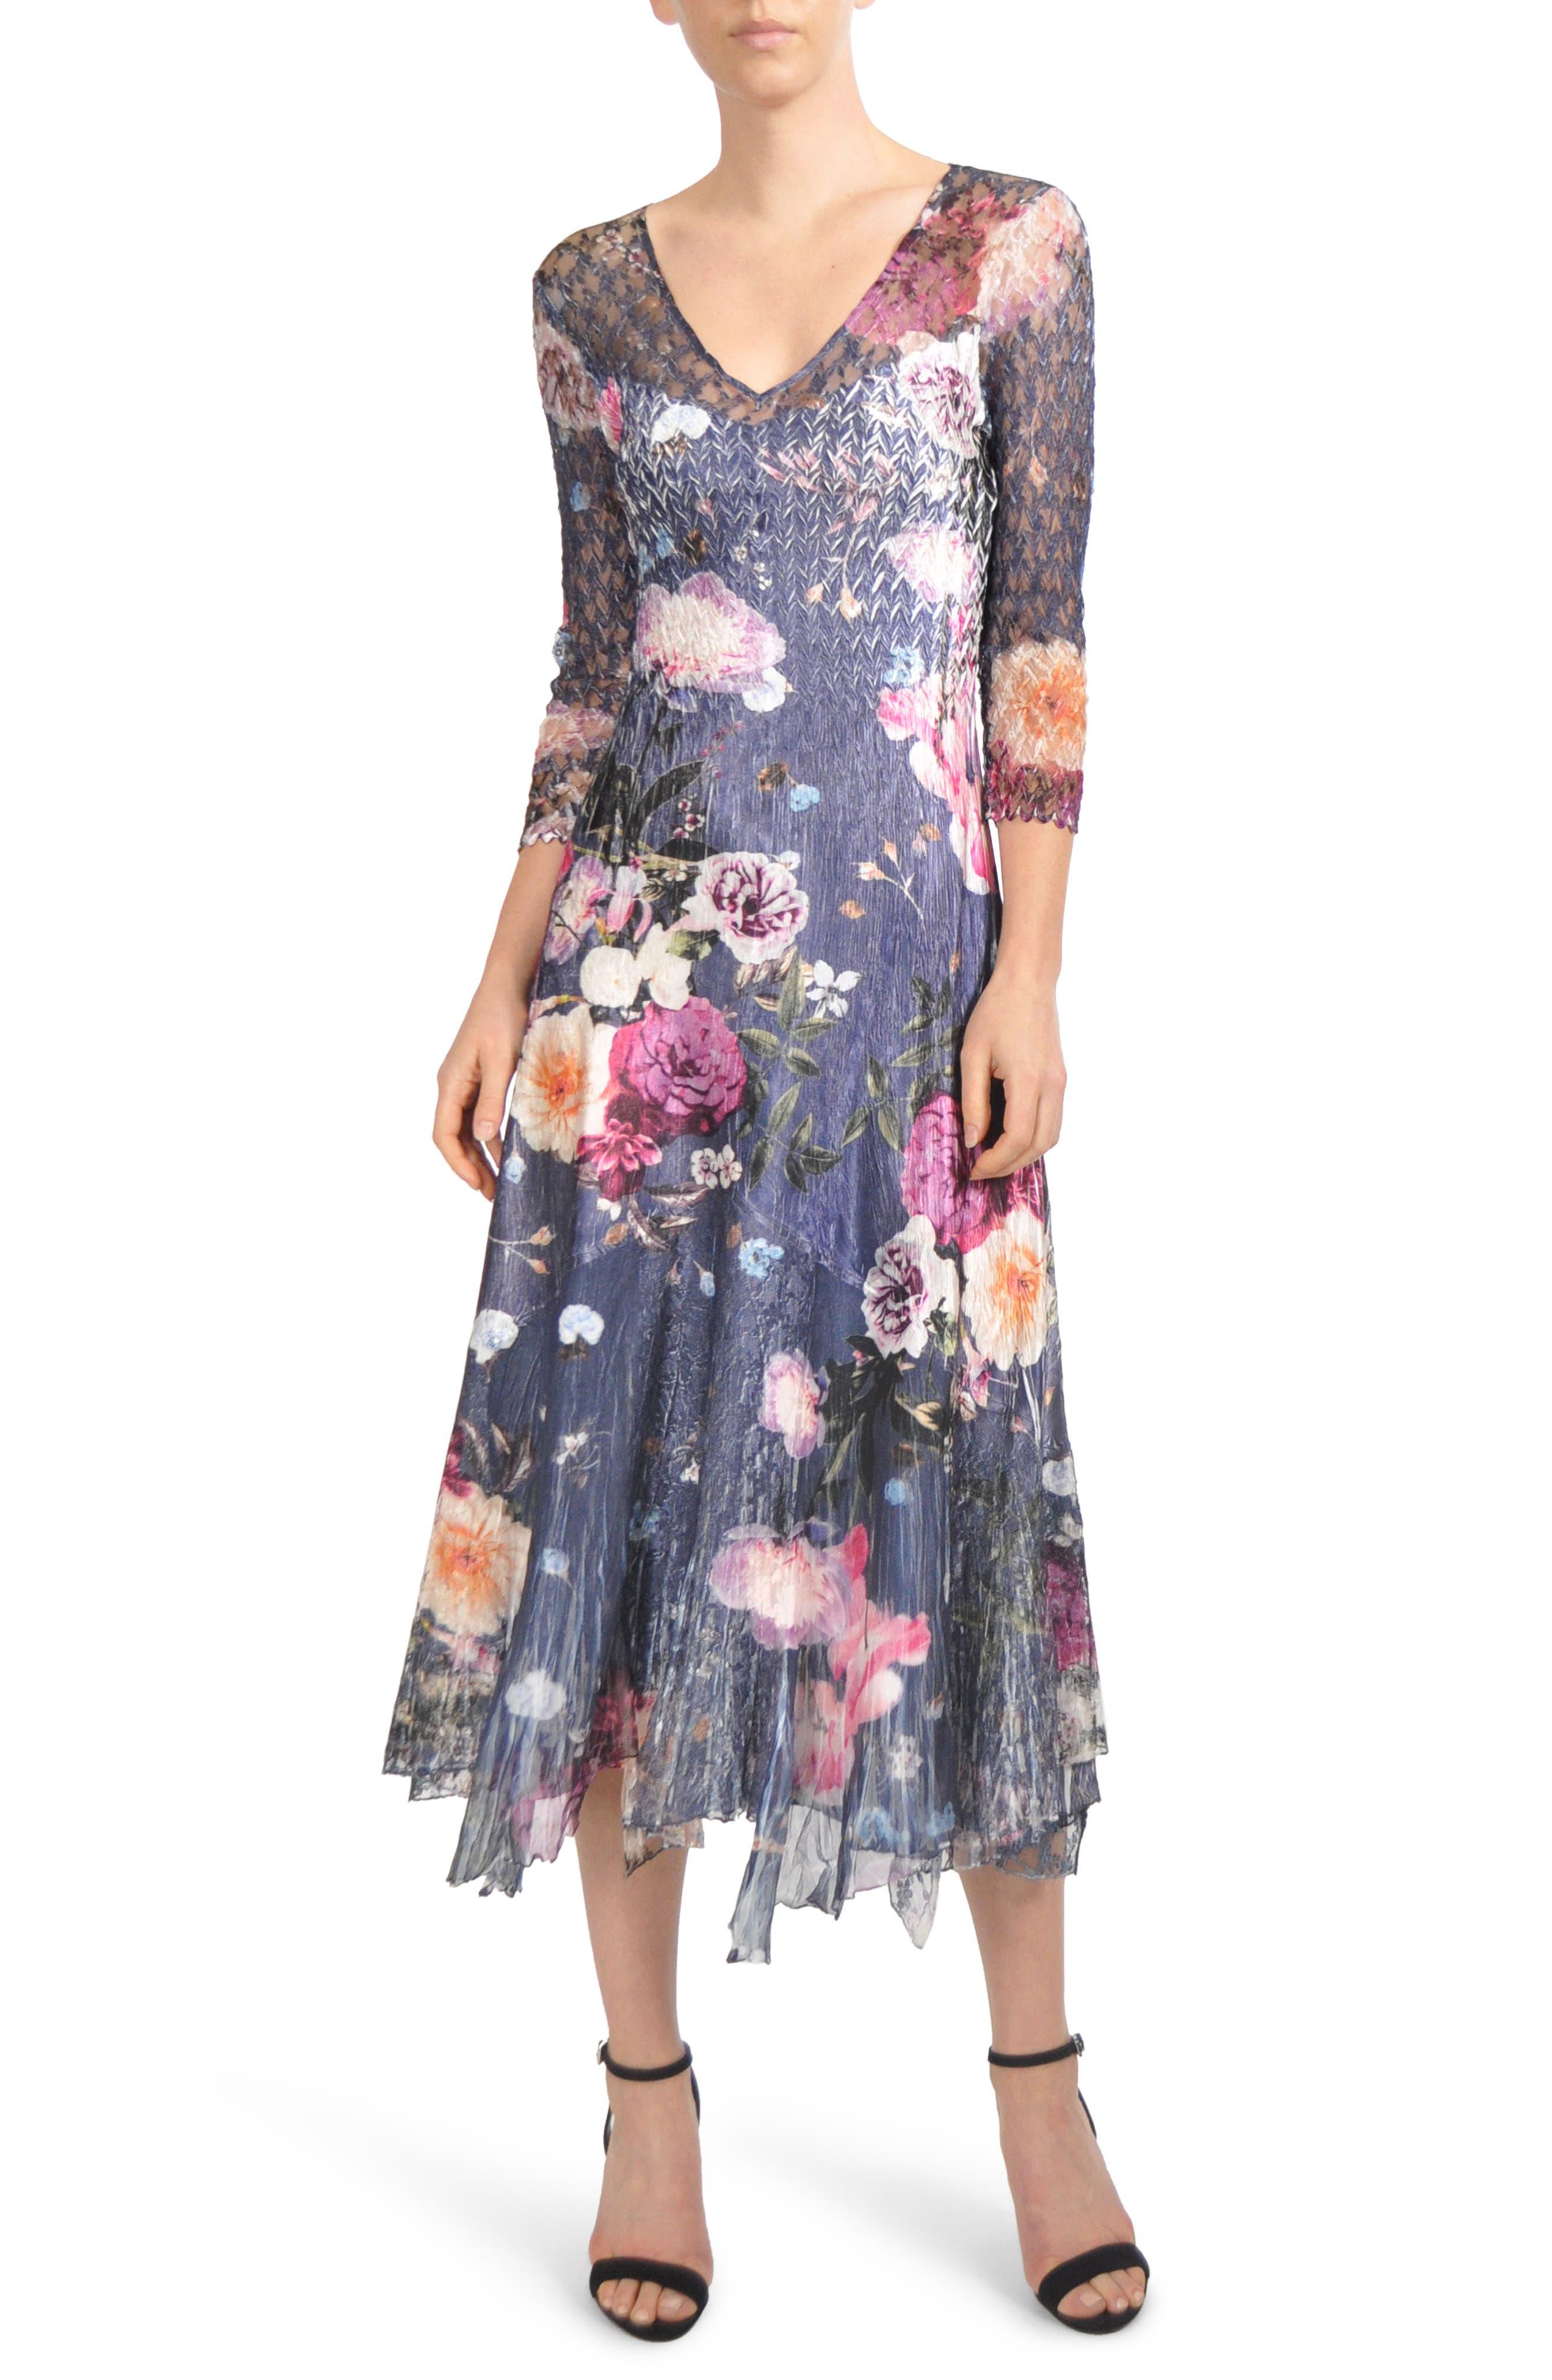 Foral Print Lace Inset Dress,                             Main thumbnail 1, color,                             401